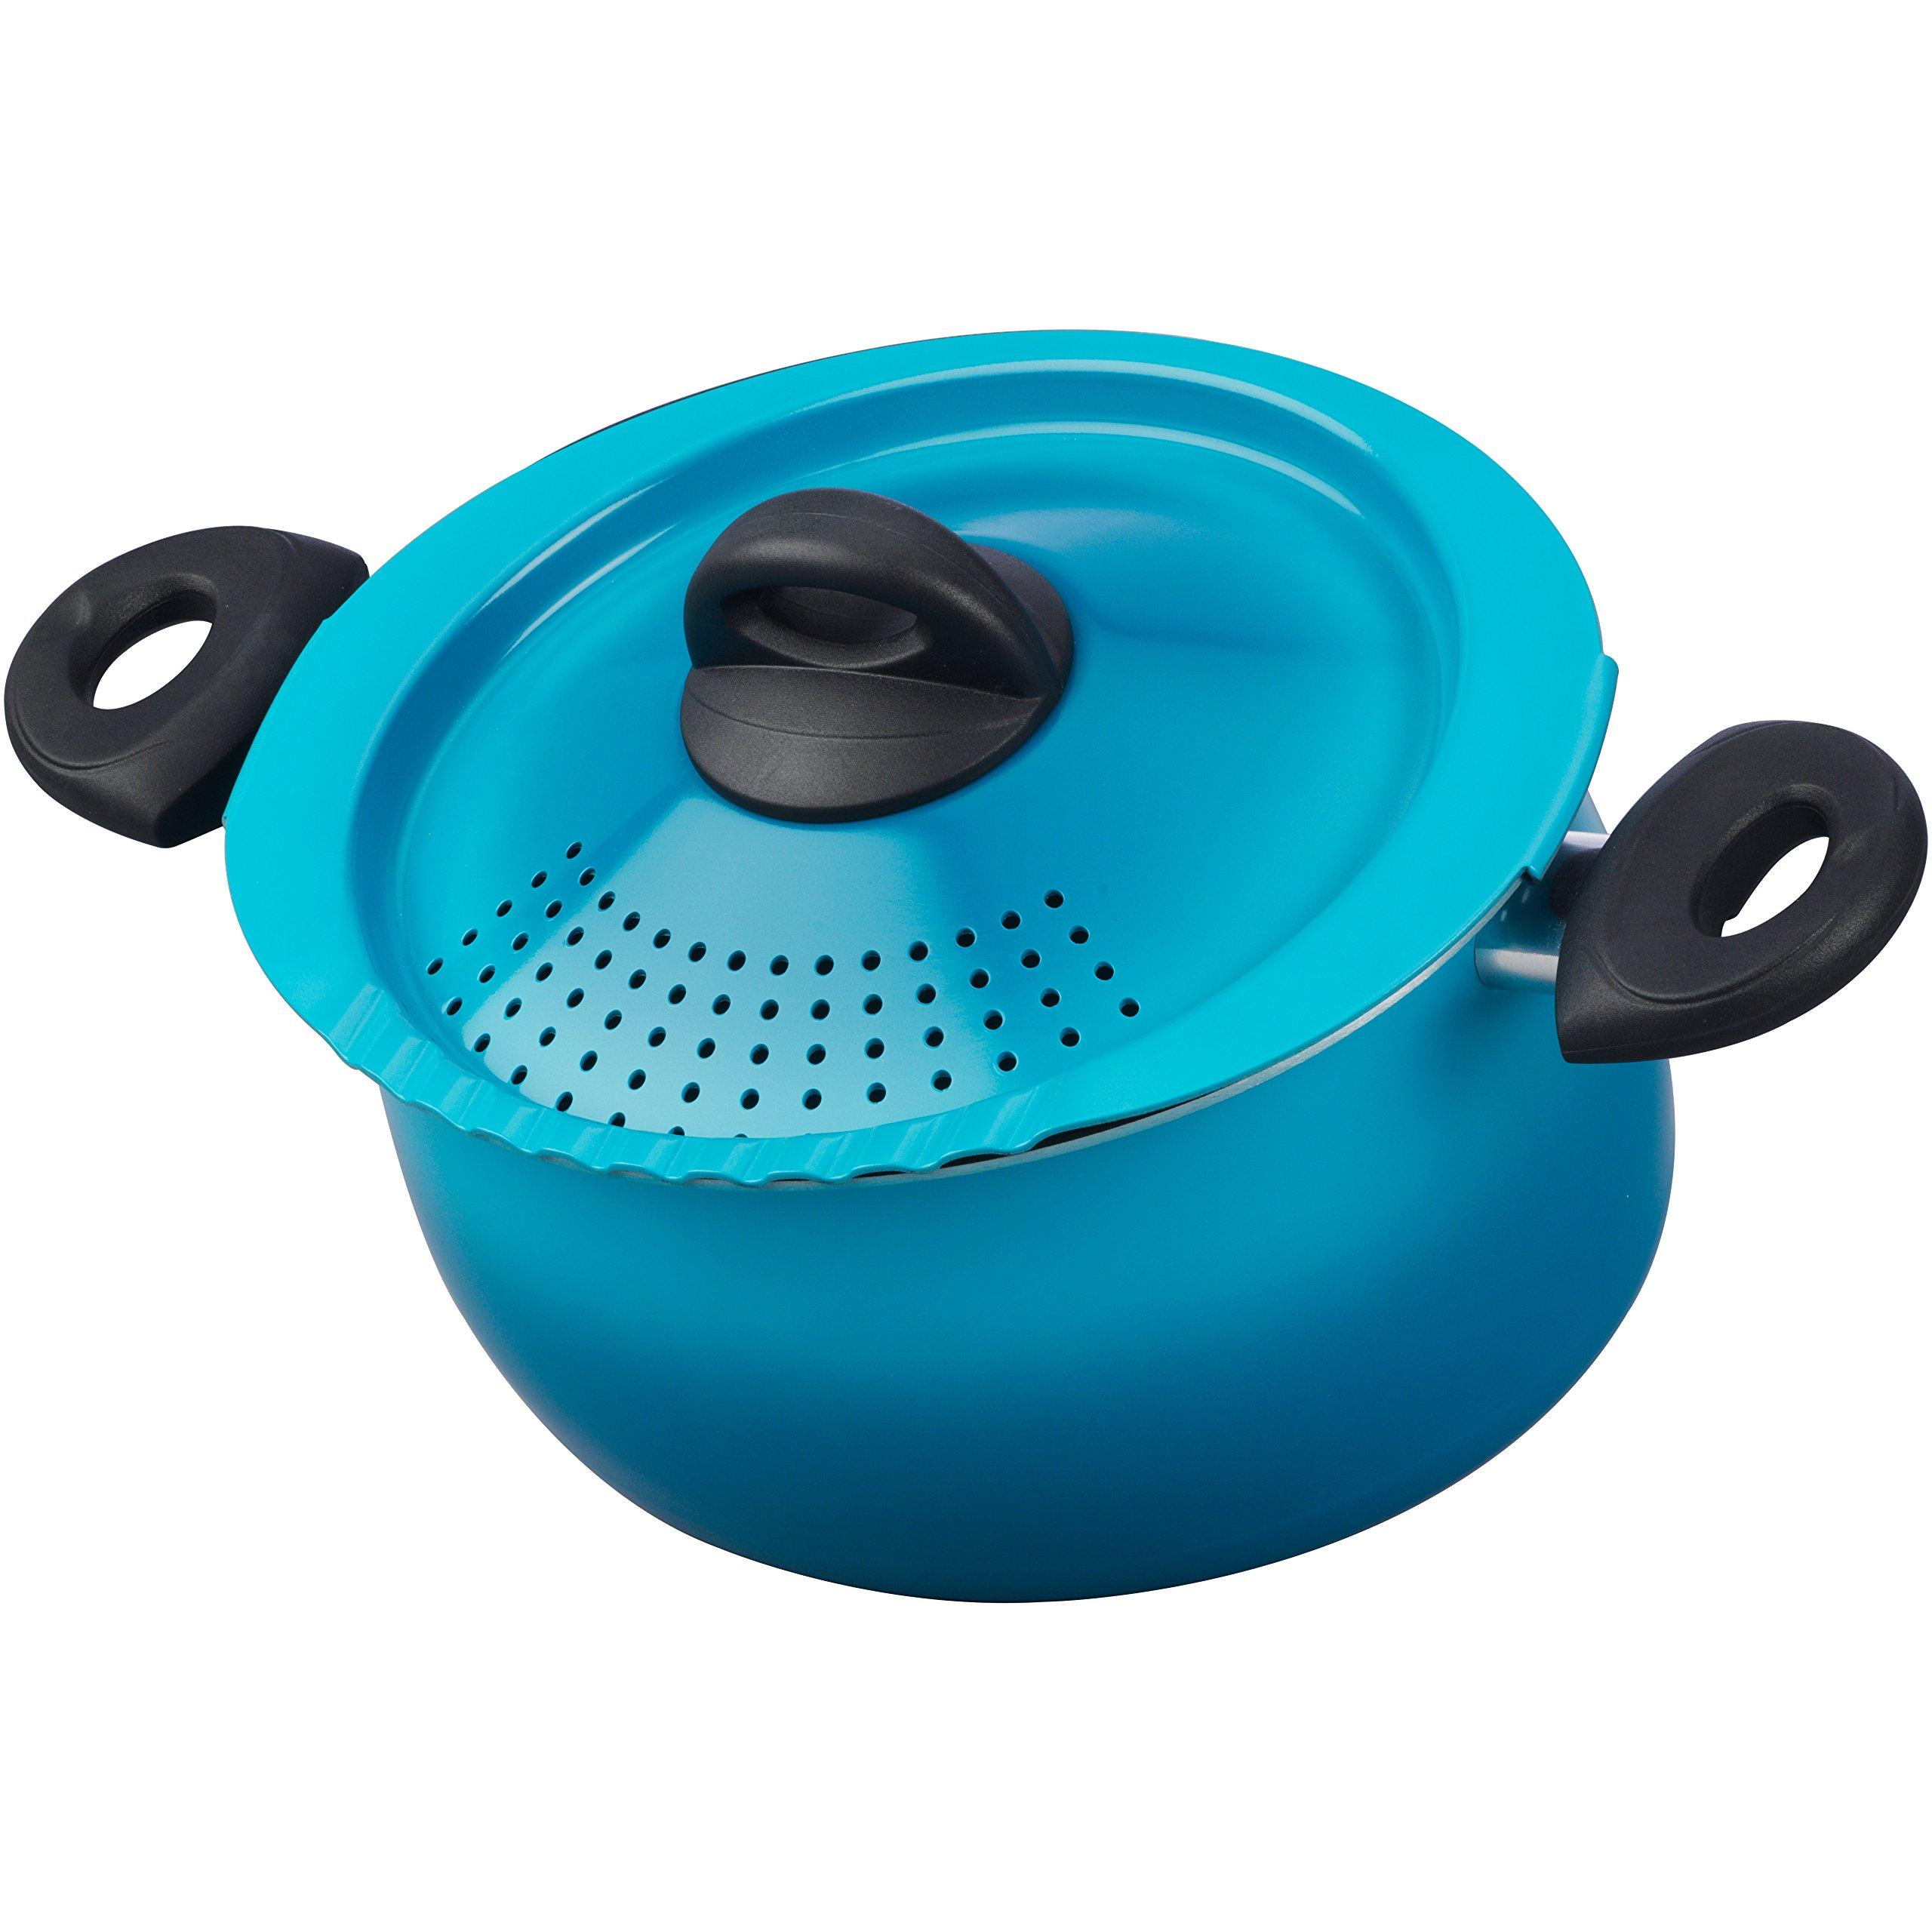 bialetti 7548 oval pasta pot with strainer lid nonstick 5 quart coastal blue 696396682670 ebay. Black Bedroom Furniture Sets. Home Design Ideas